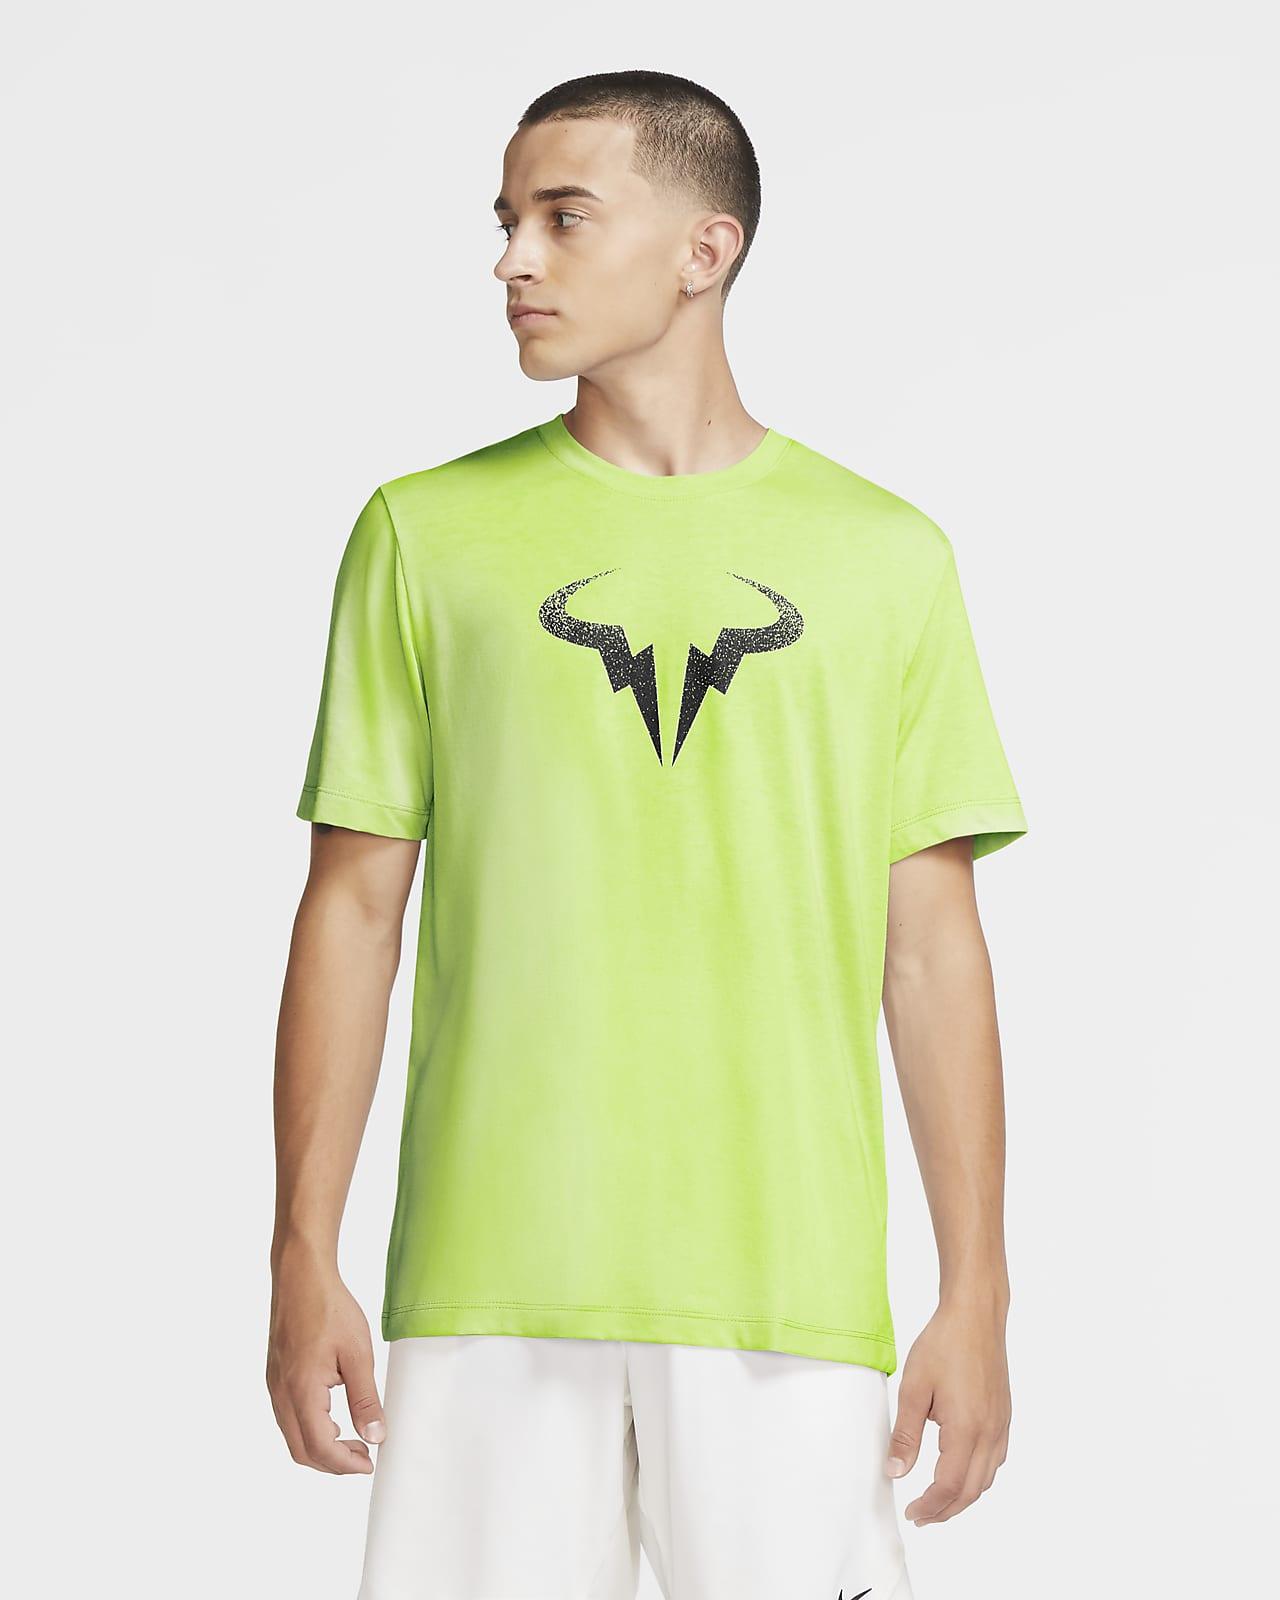 Rafa Men's Tennis T-Shirt